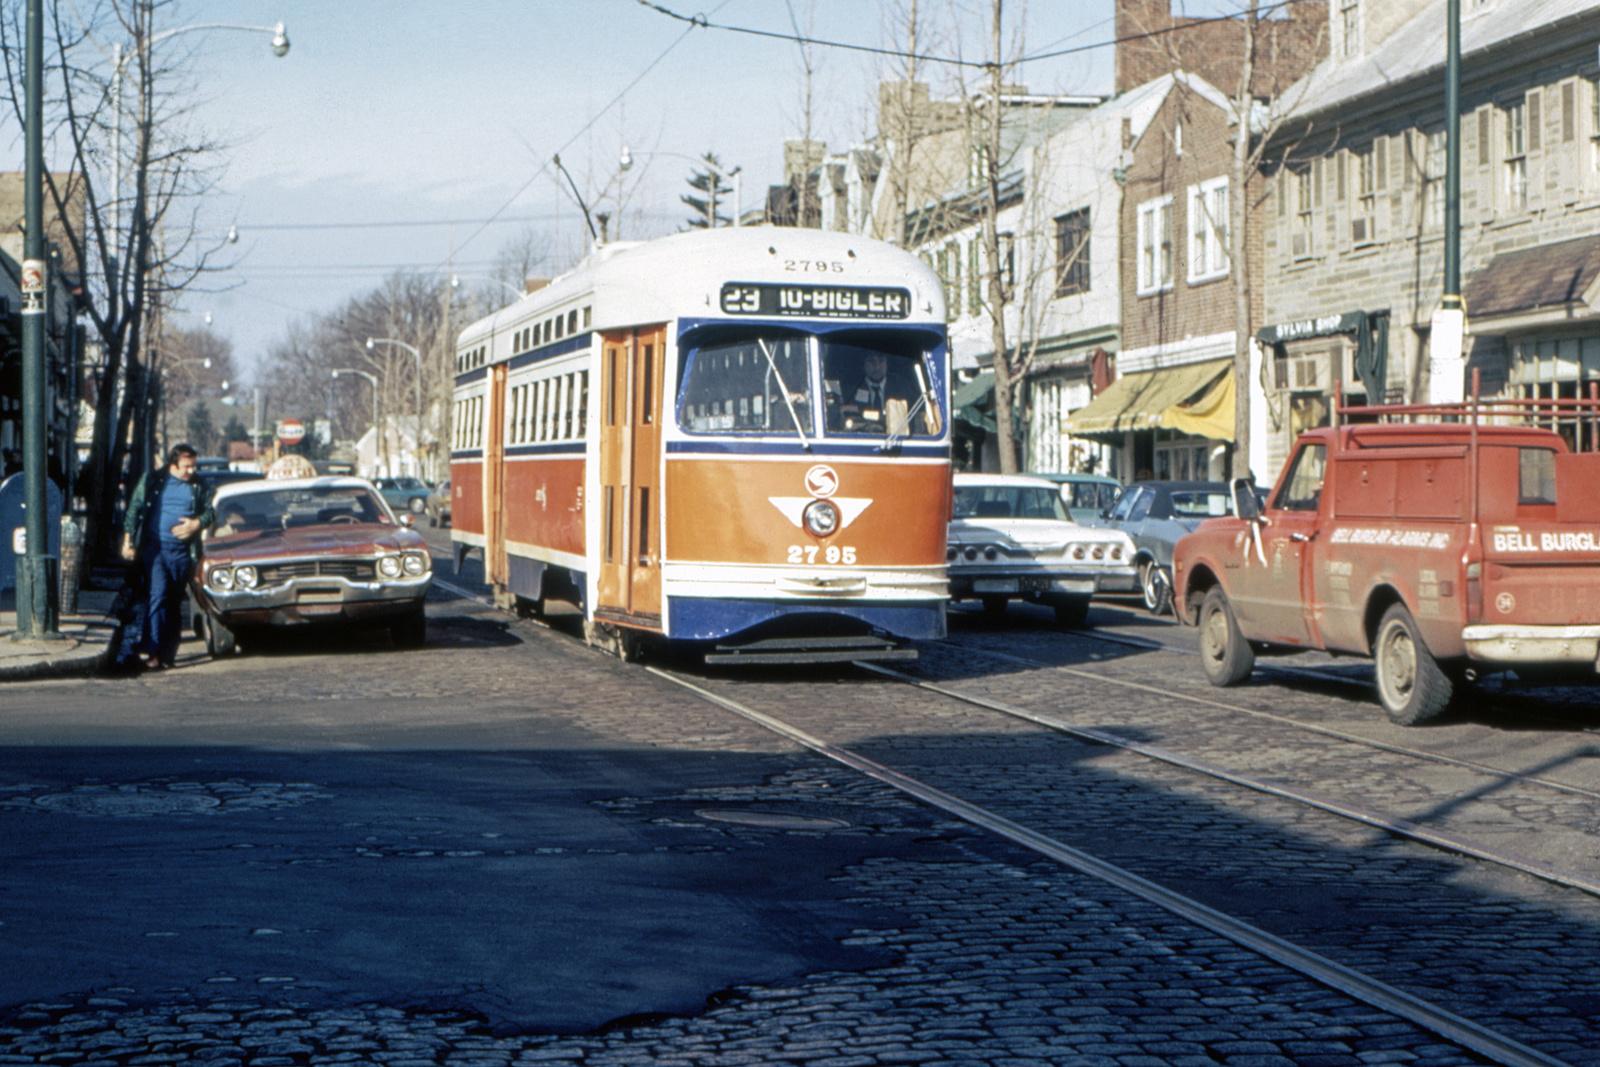 (784k, 1600x1067)<br><b>Country:</b> United States<br><b>City:</b> Philadelphia, PA<br><b>System:</b> SEPTA (or Predecessor)<br><b>Line:</b> Rt. 23-Germantown<br><b>Location:</b> Germantown/Highland<br><b>Car:</b> PTC/SEPTA Postwar All-electric PCC (St.Louis, 1947) 2795 <br><b>Collection of:</b> David Pirmann<br><b>Viewed (this week/total):</b> 0 / 44